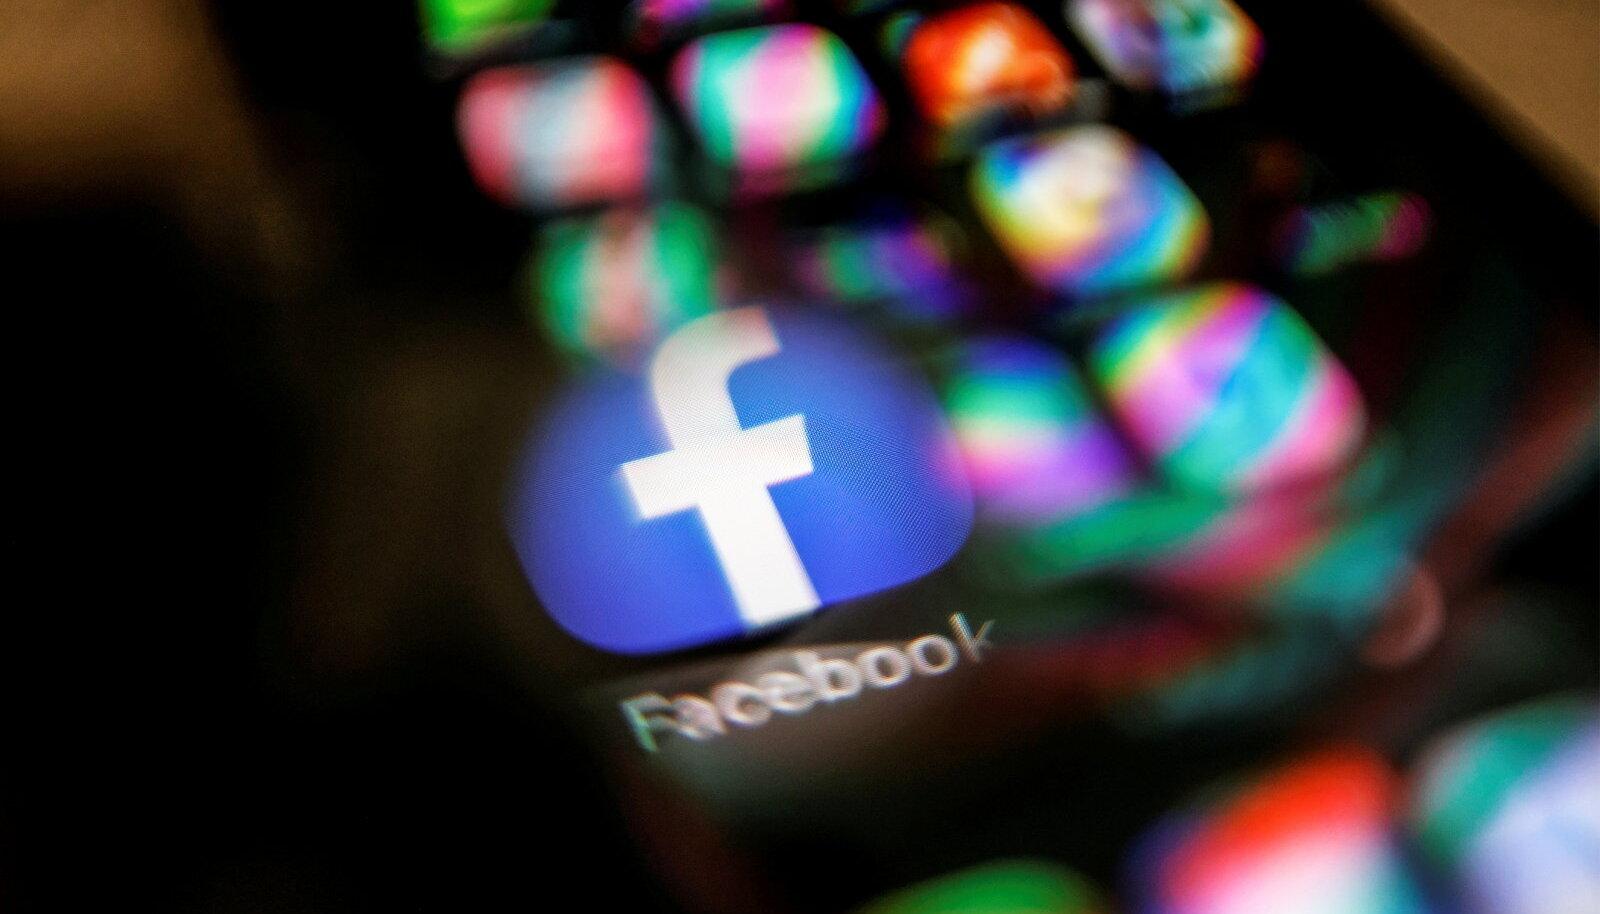 Facebooki mobiilirakendus